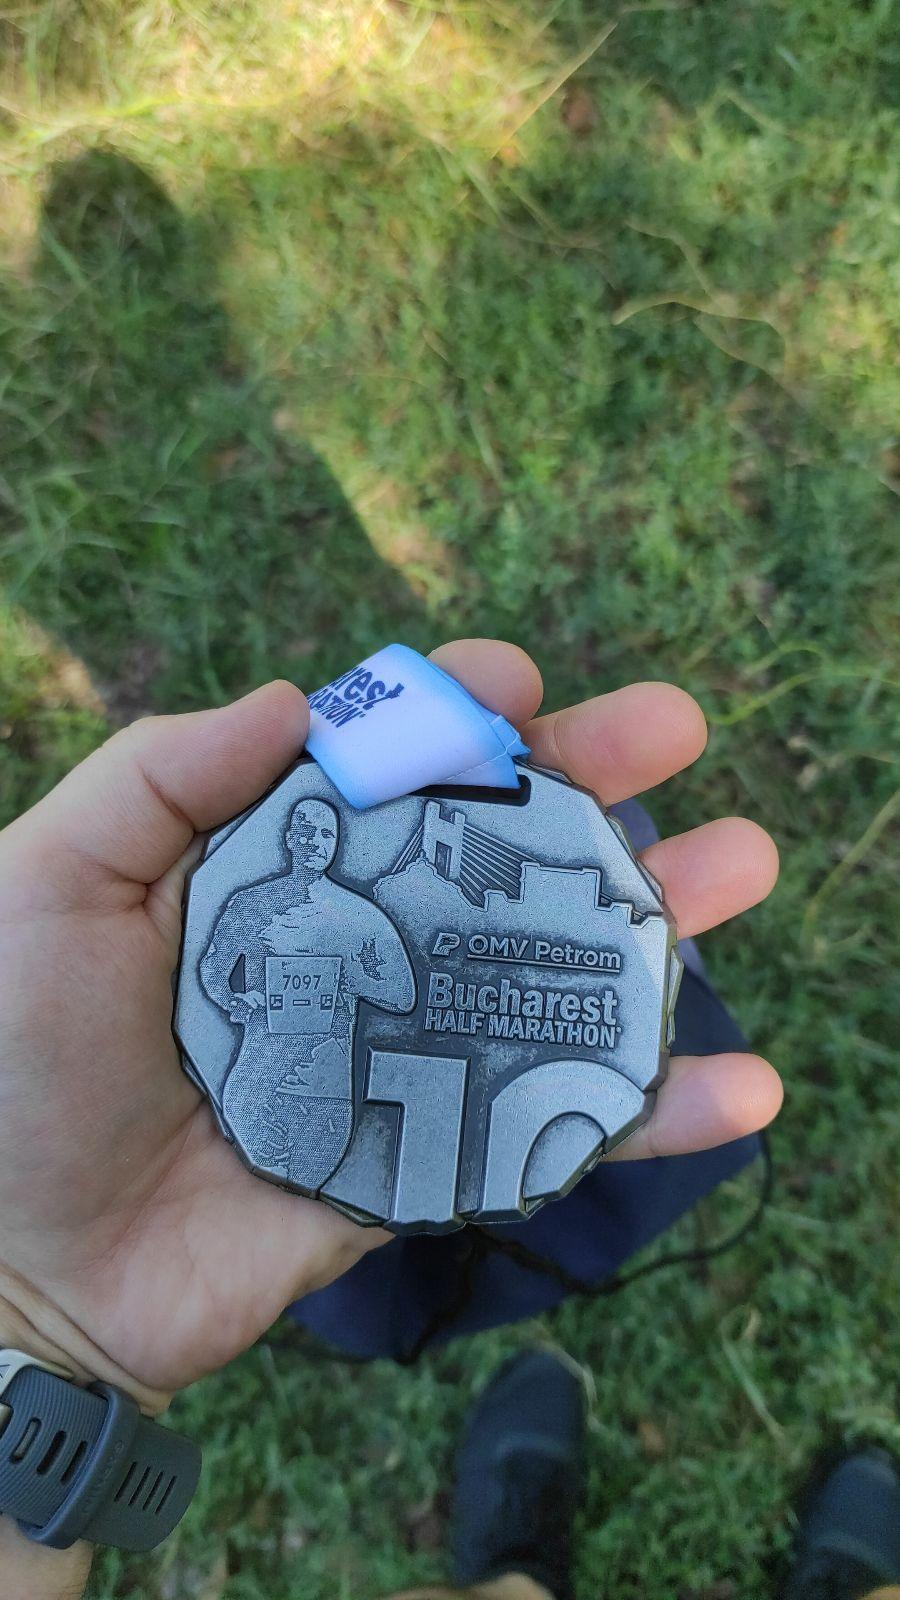 Medalia de finish de la cursa de 5K a Bucharest Half Marathon